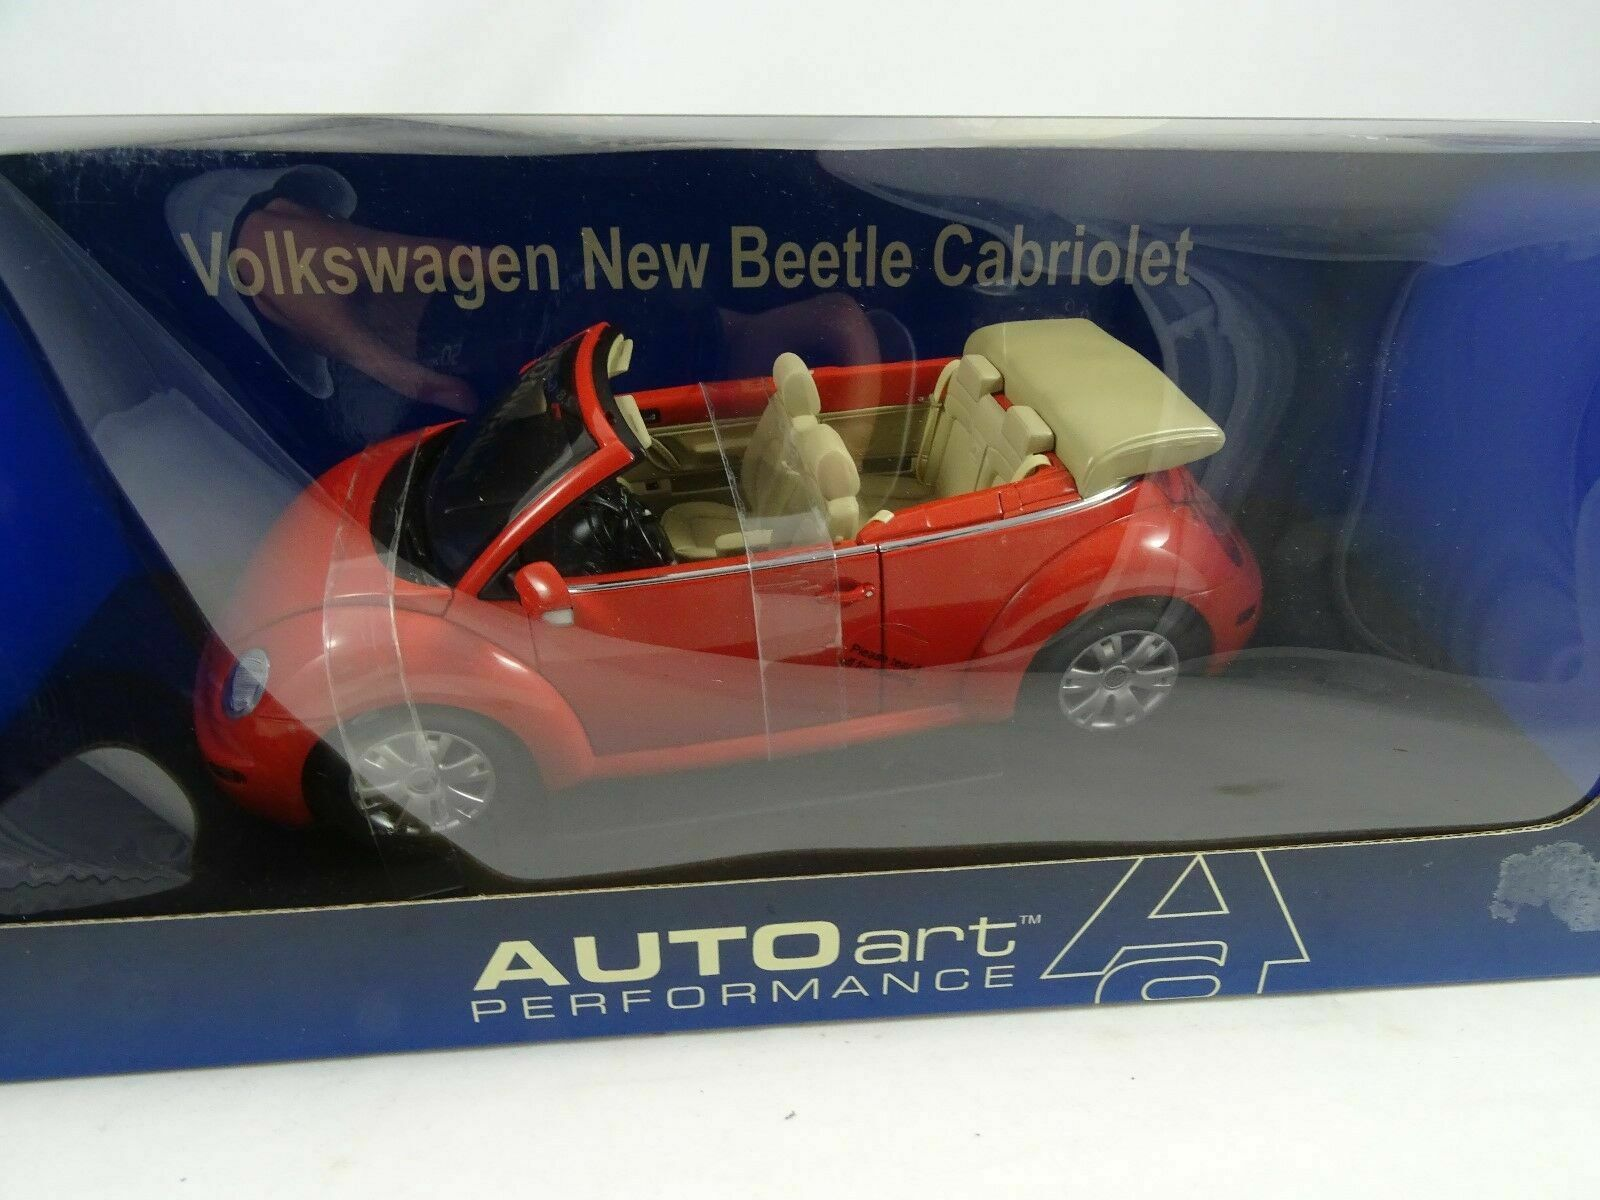 1 18 Autoart 79754 VW Volkswagen New Beetle Cabriolet Sundown naranja